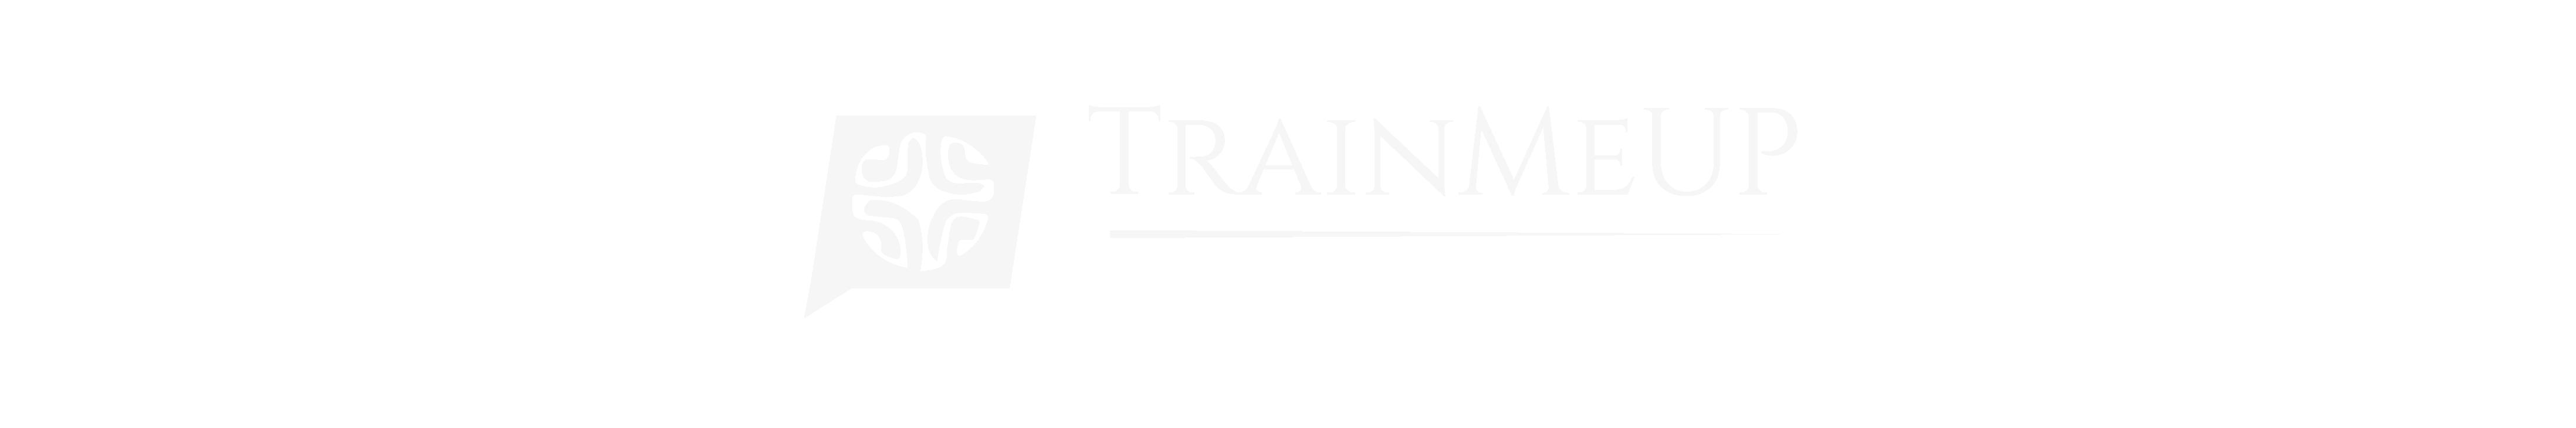 TrainMeUP